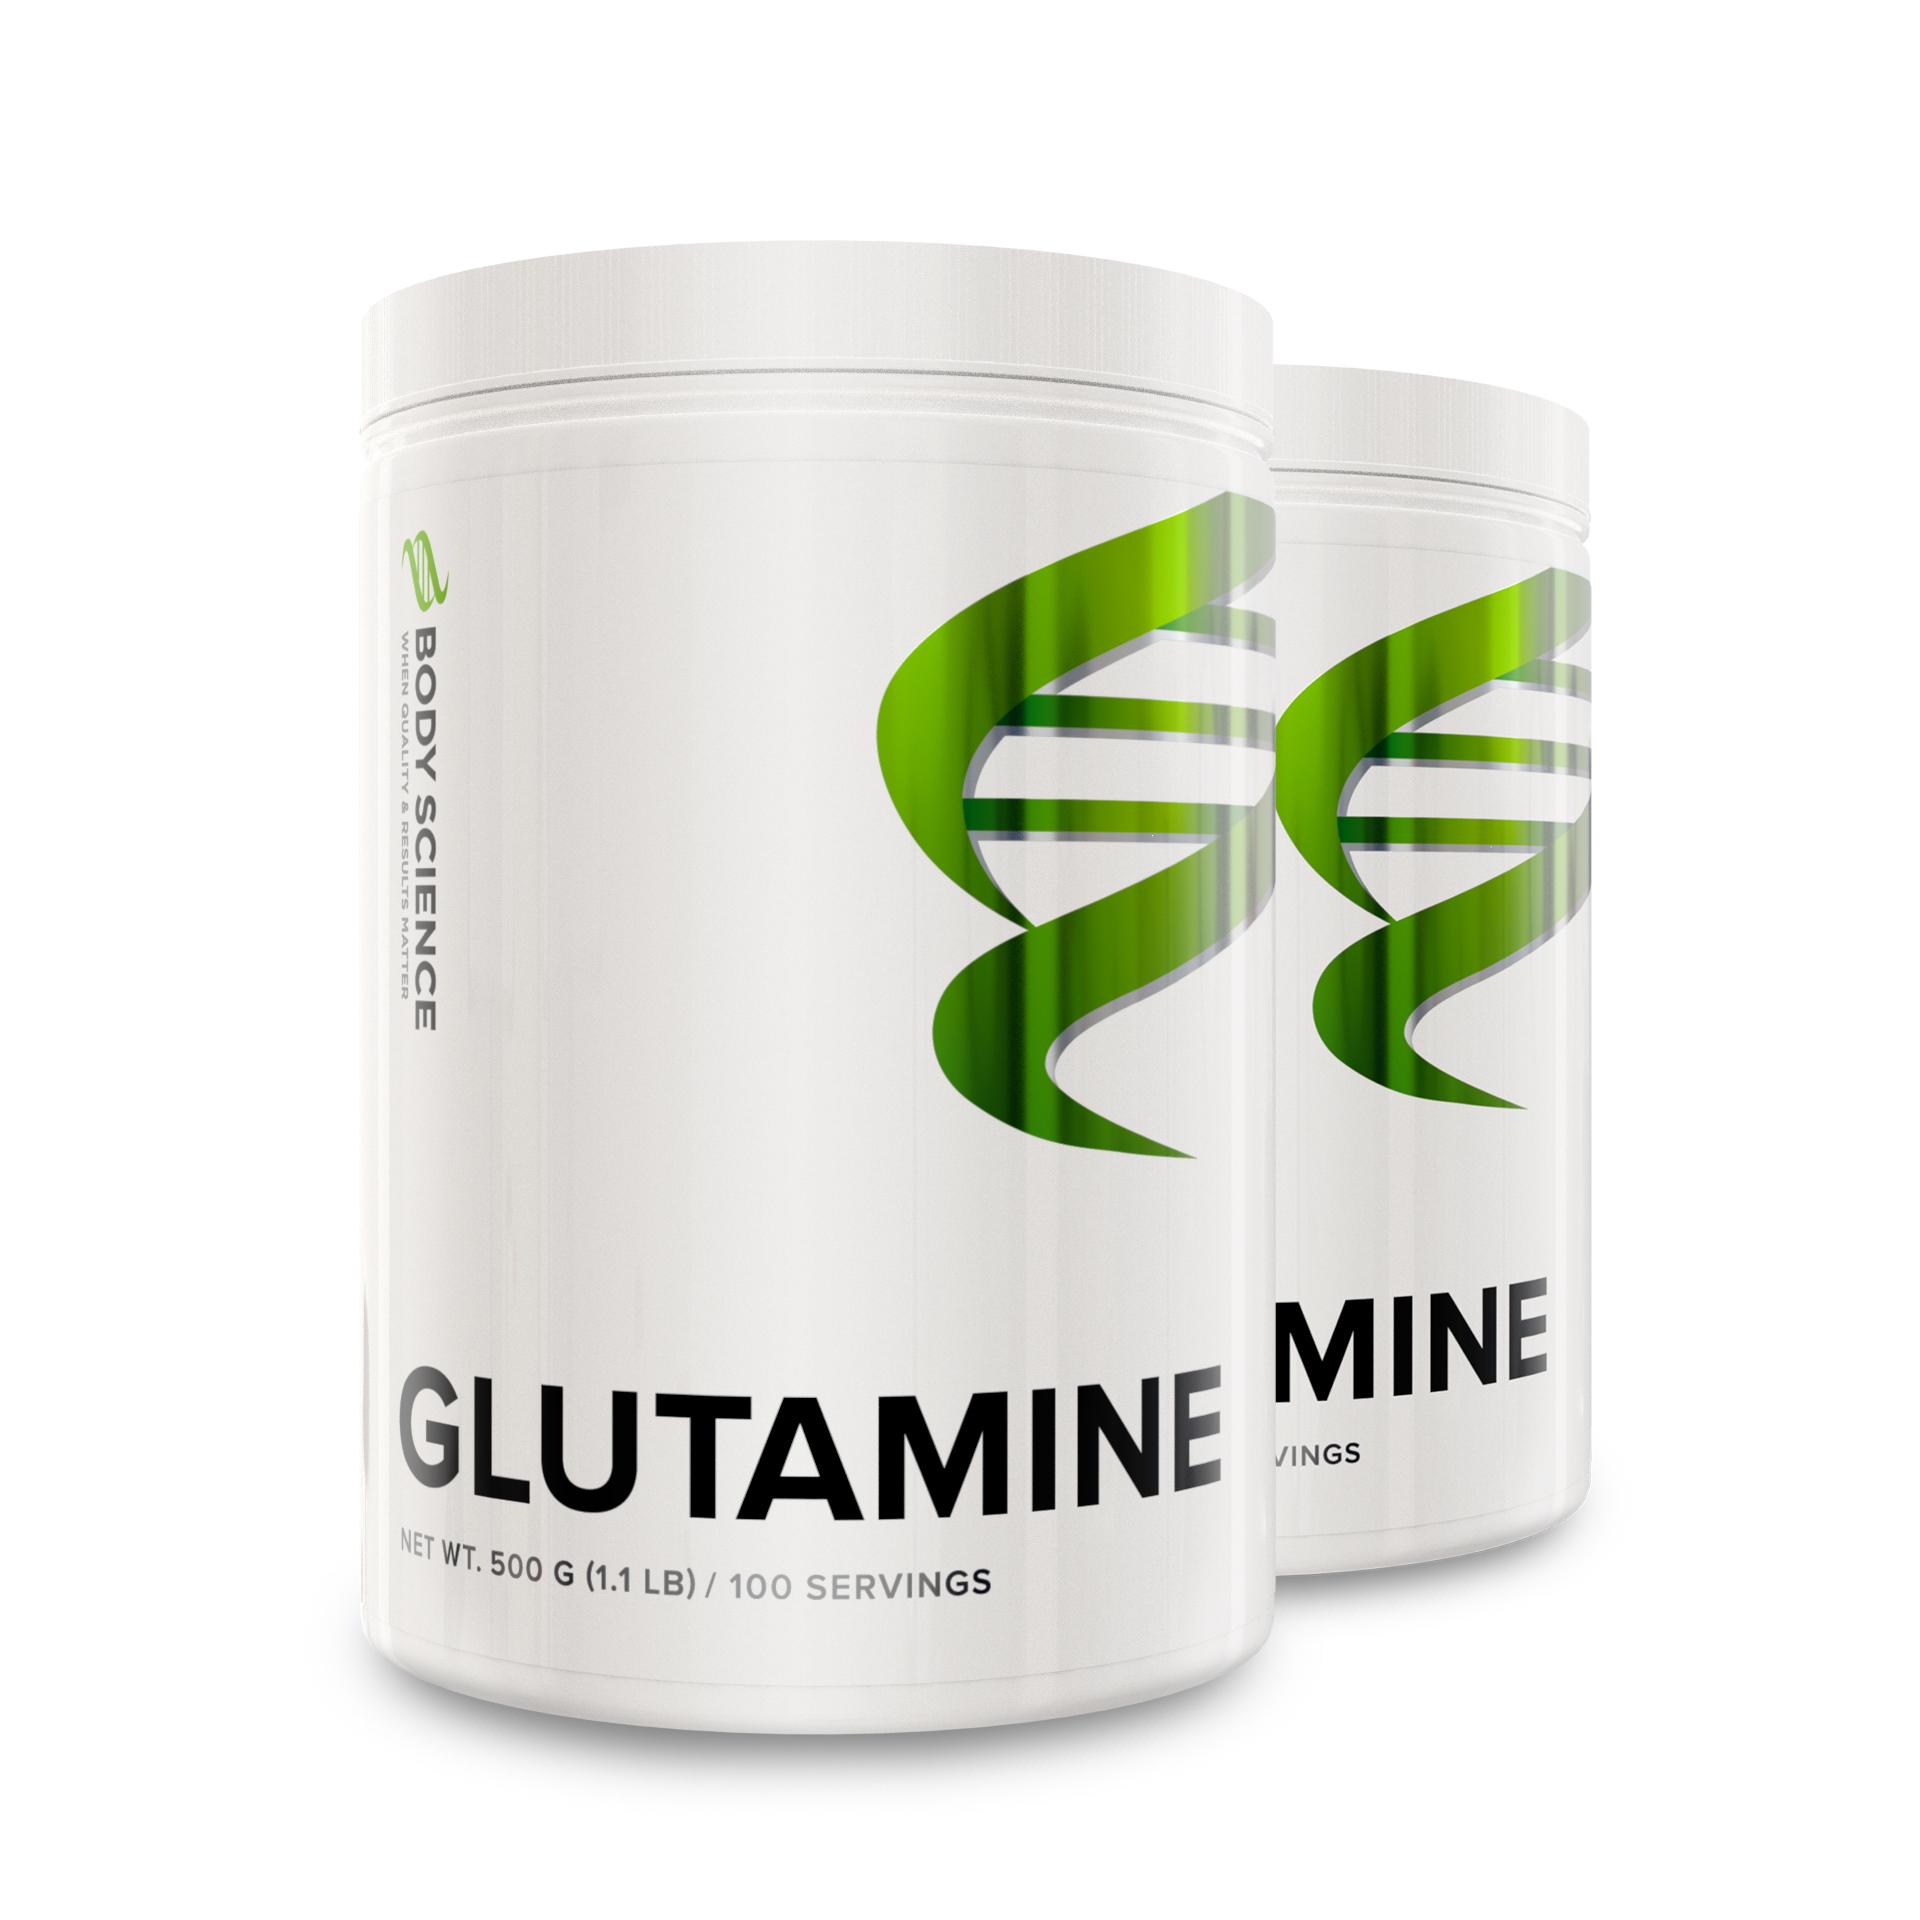 Glutamine 2-pack